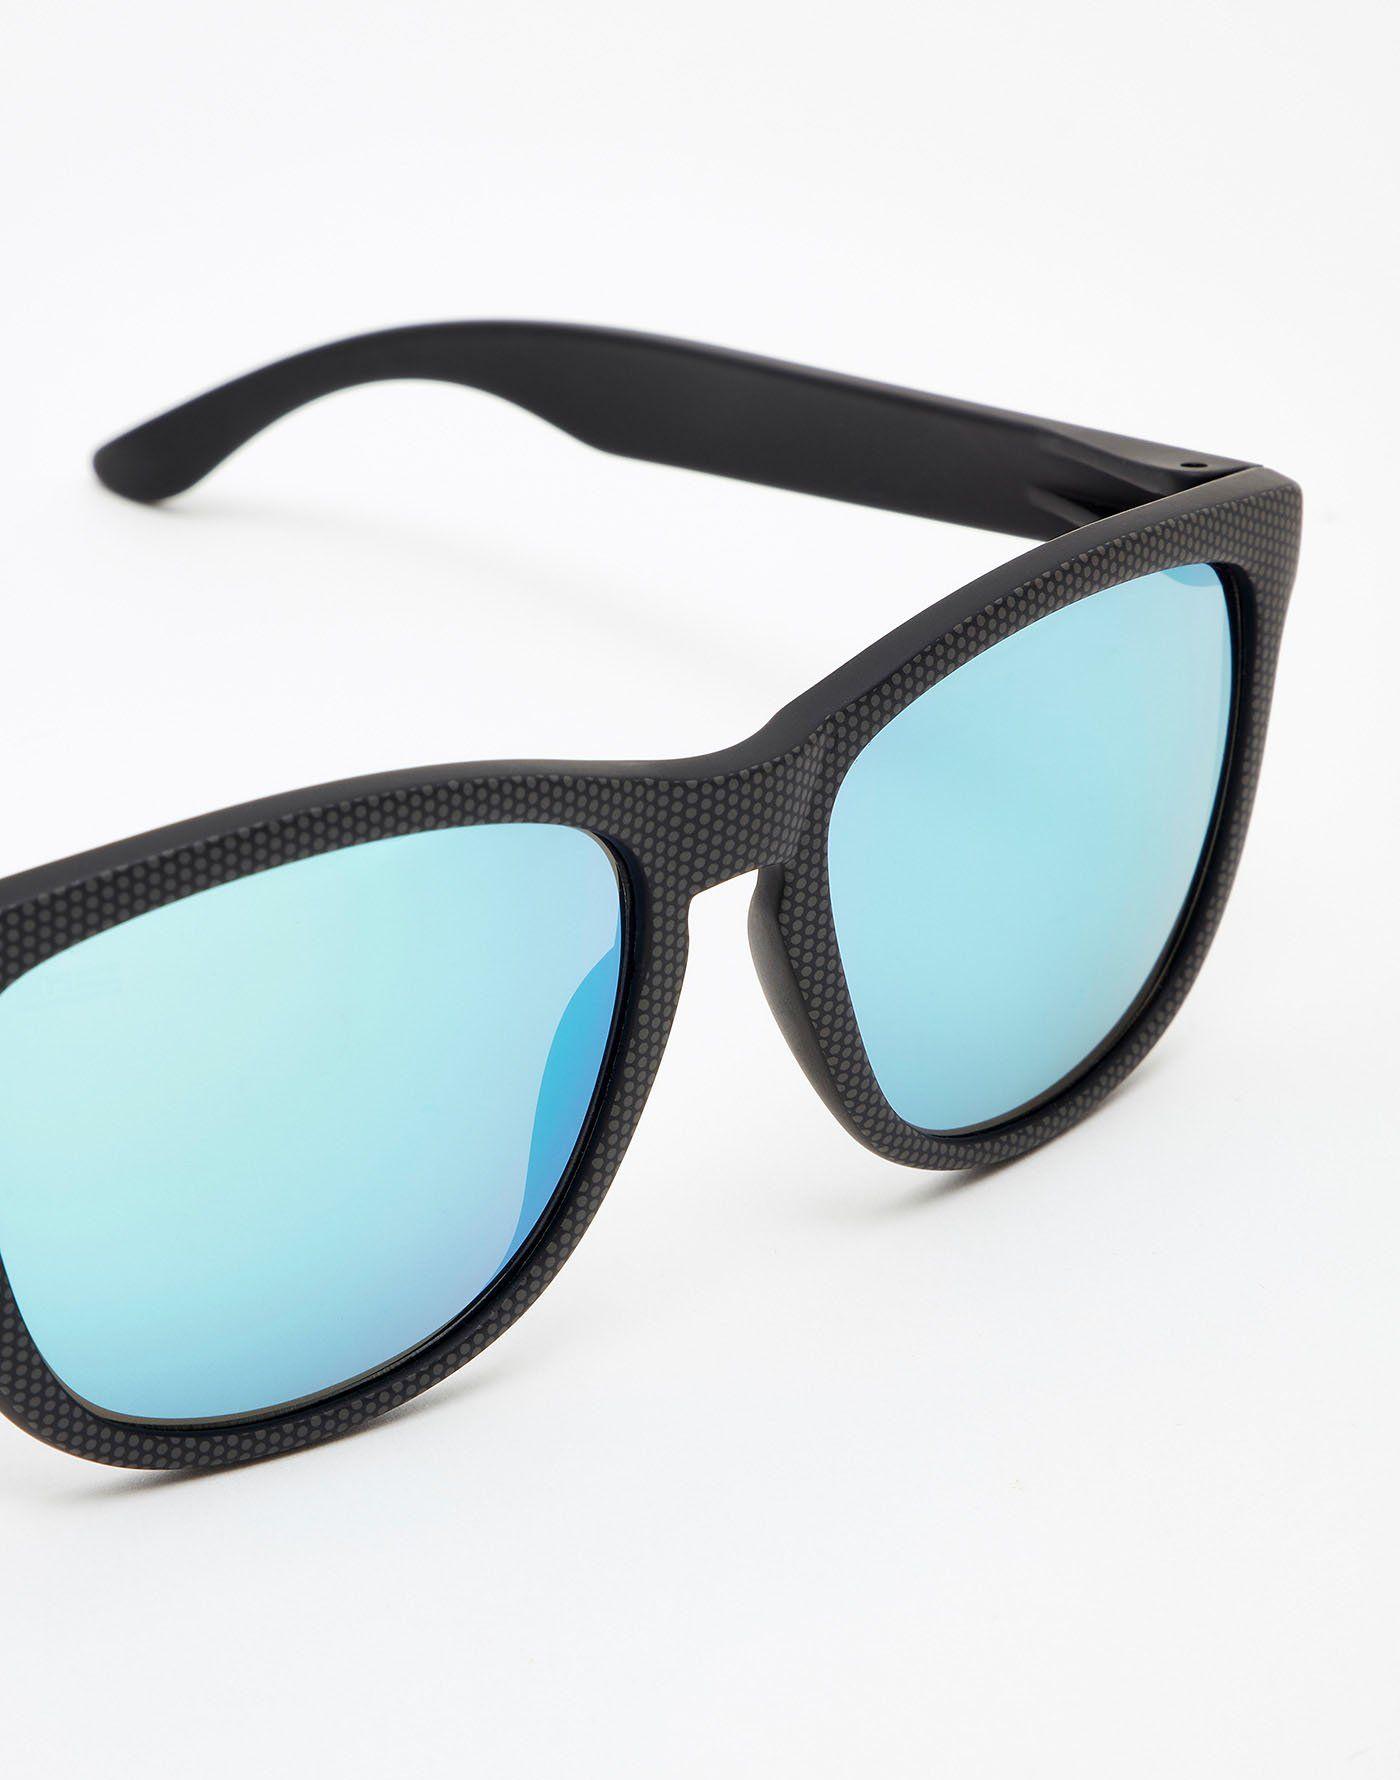 7f4661e4b2 CARBONO SPOTTED BLUE CHROME ONE La colección One se define por sus modelos  de gafas de